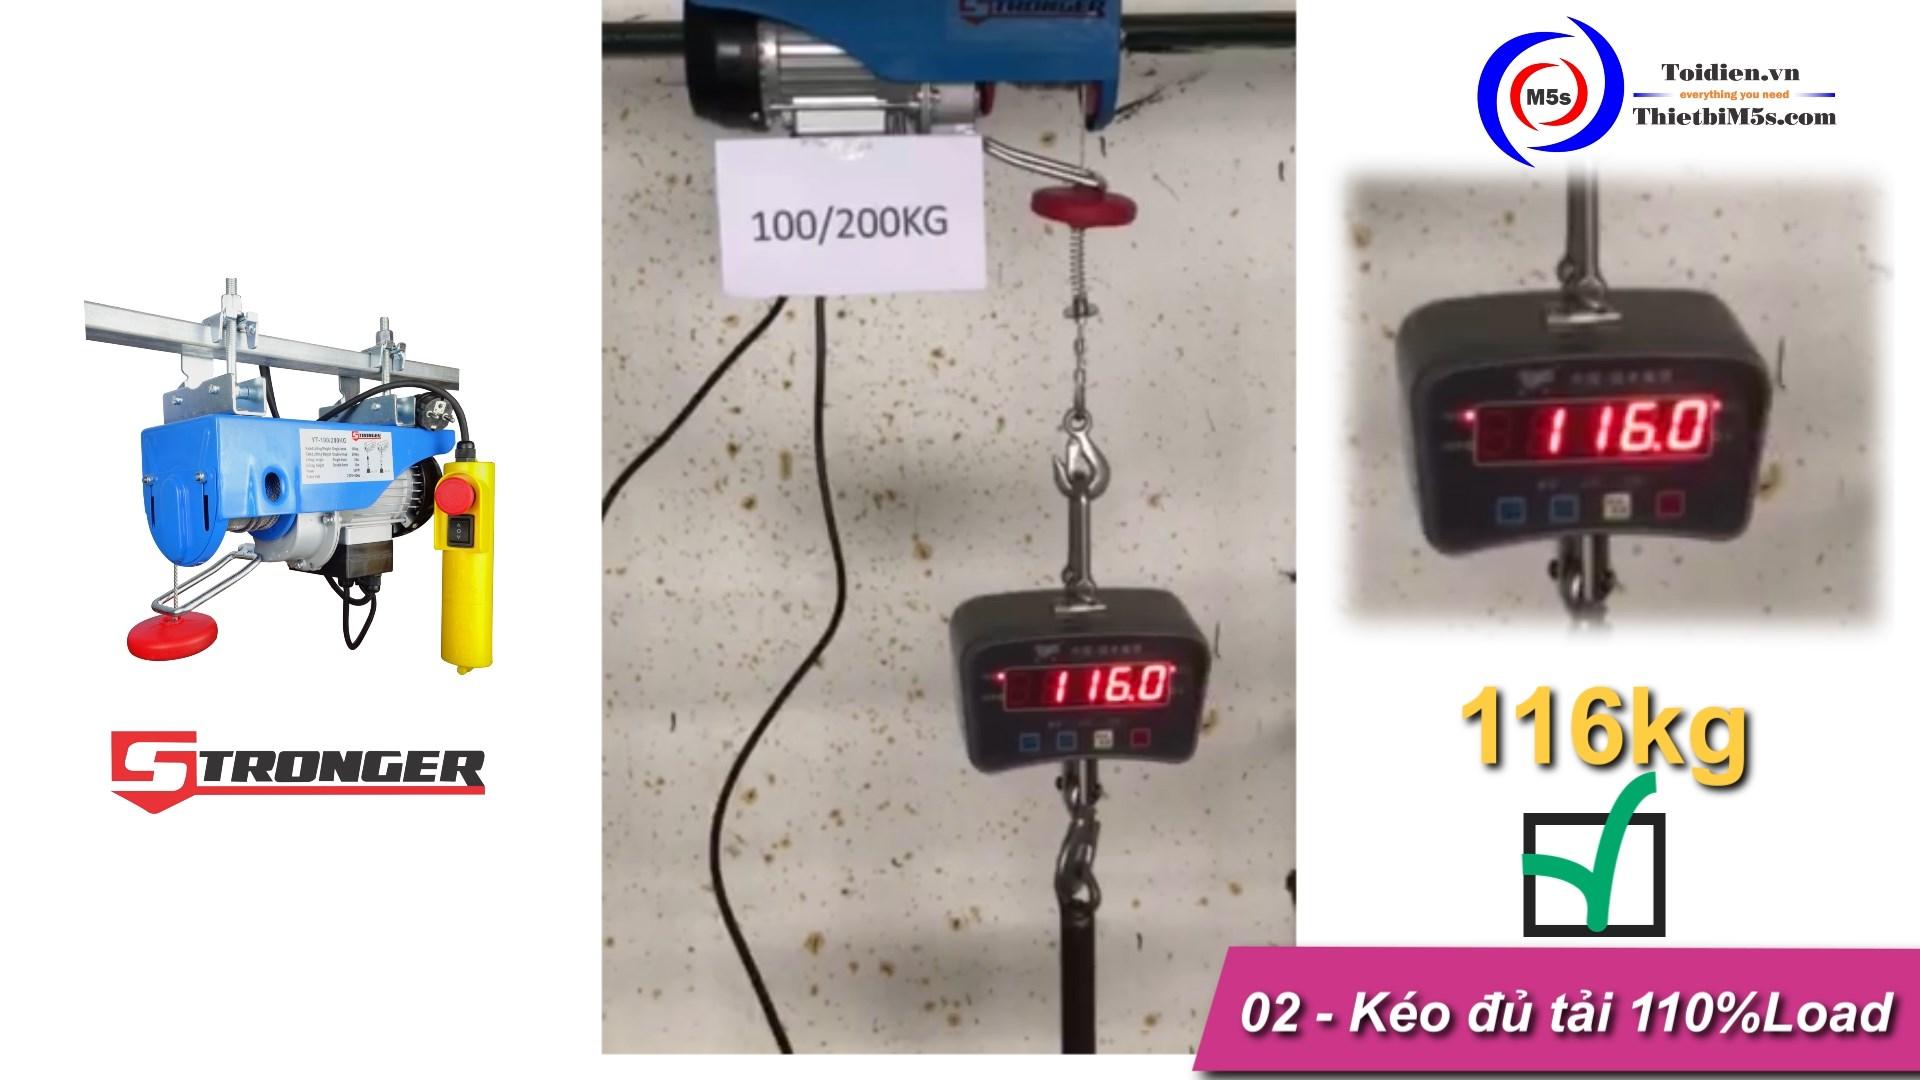 TỜI ĐIỆN MINI 100-200KG STRONGER